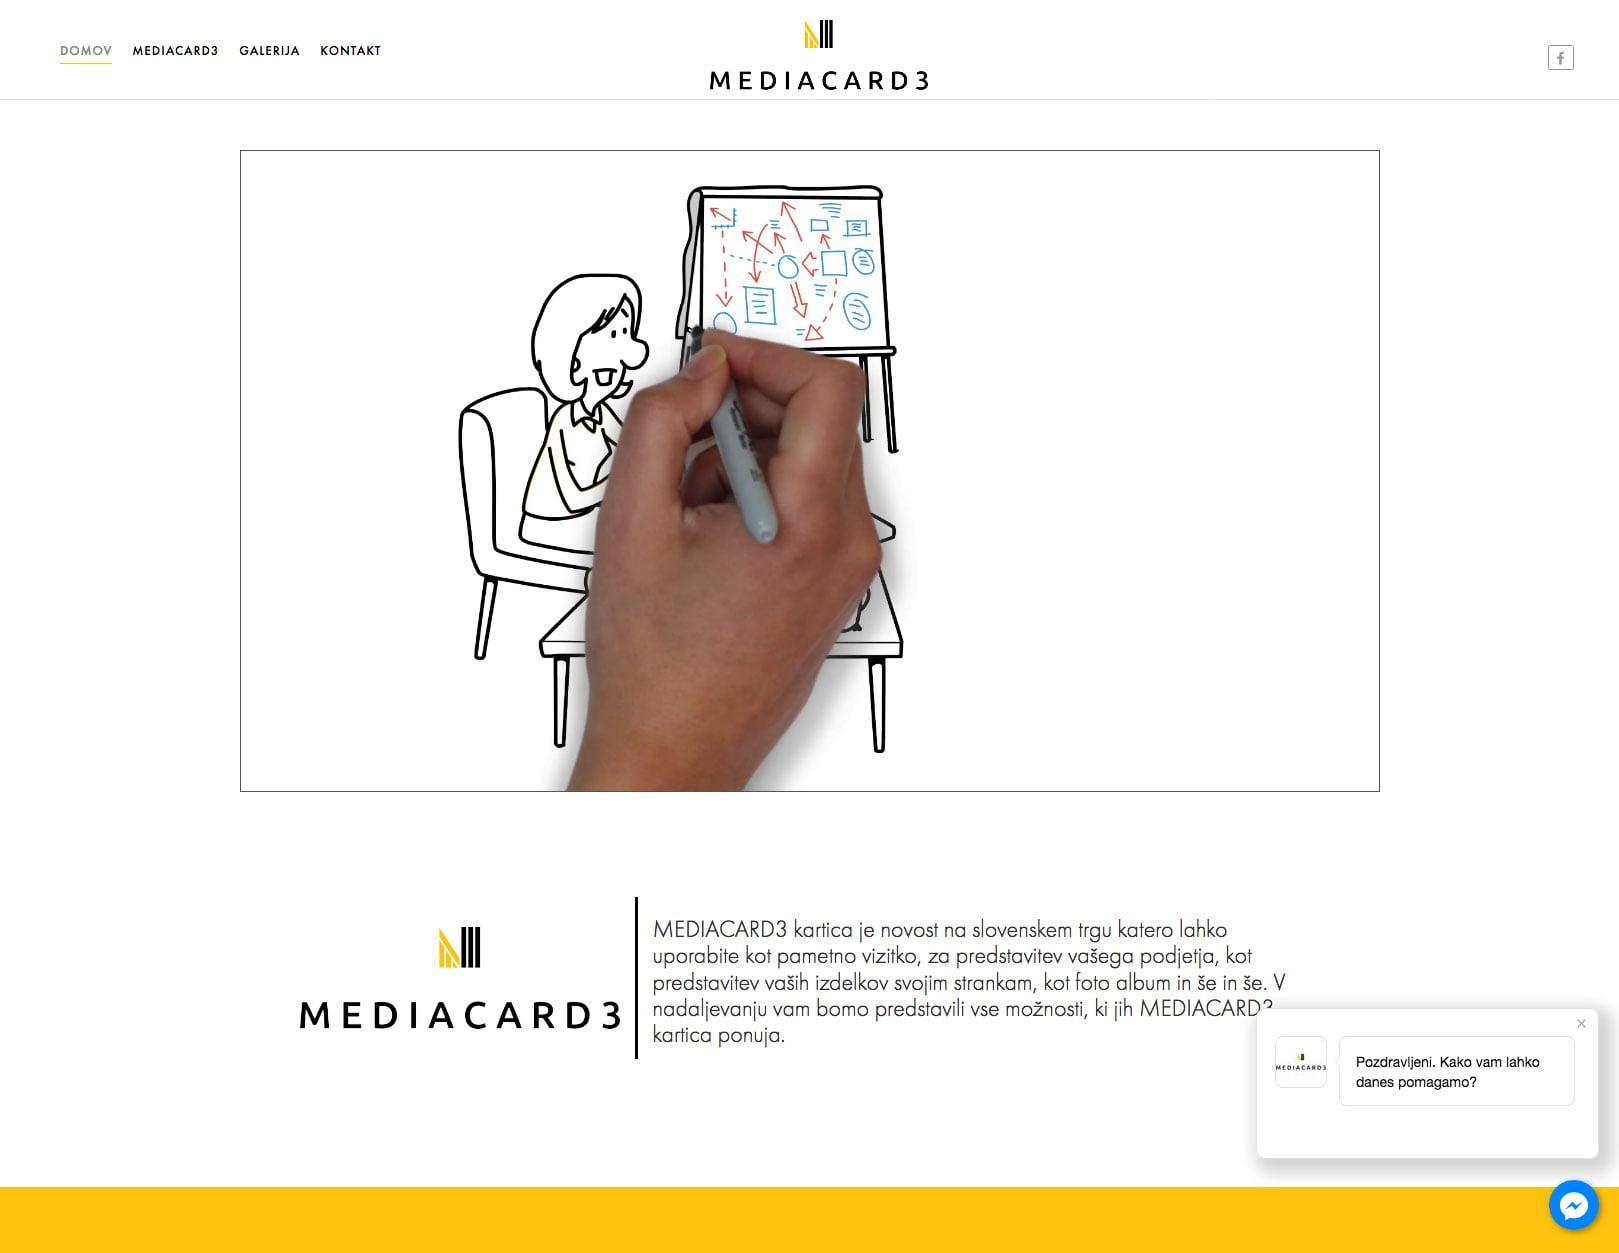 mediacard3